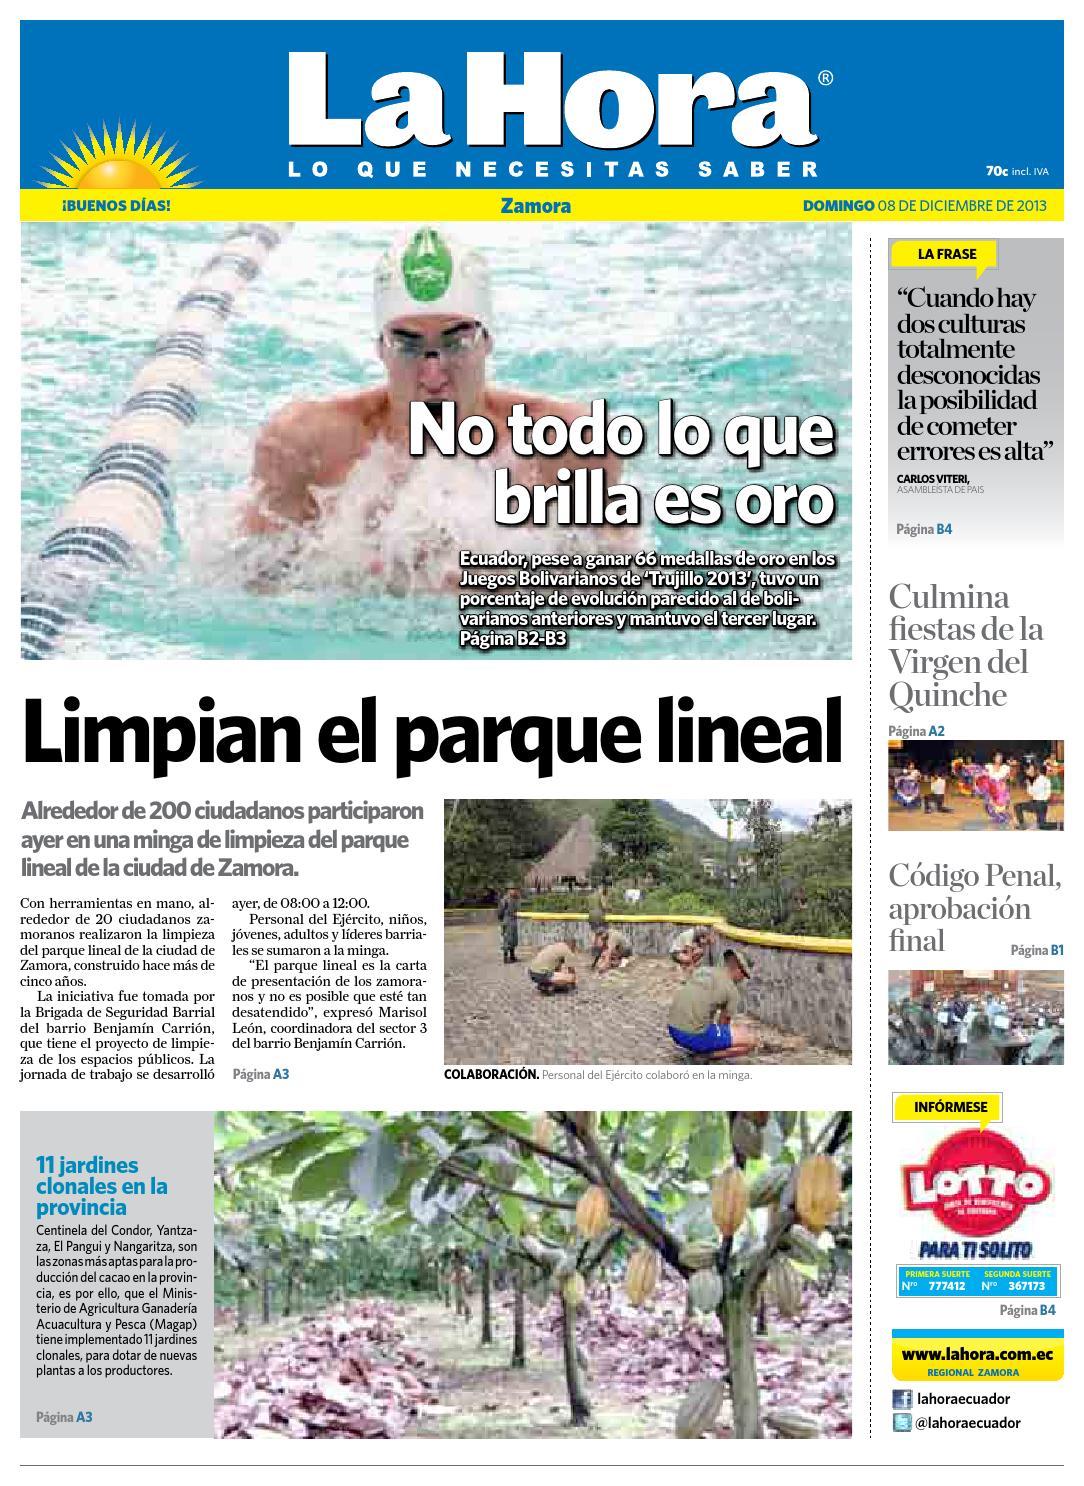 Impreso 05 09 13 by Diario Opinion - issuu